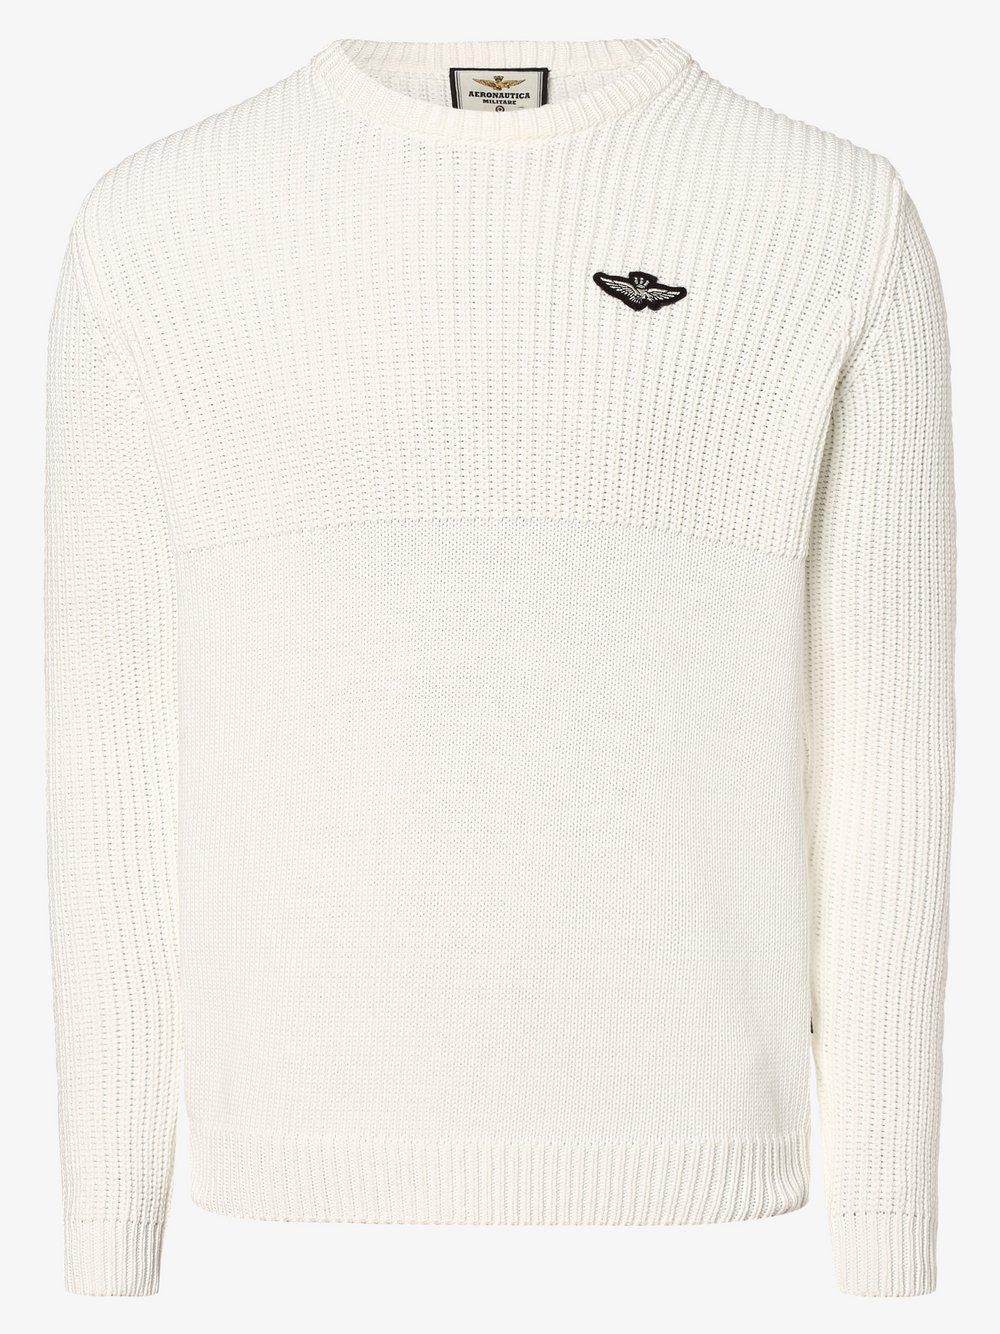 Aeronautica – Sweter męski, biały Van Graaf 477199-0001-09920